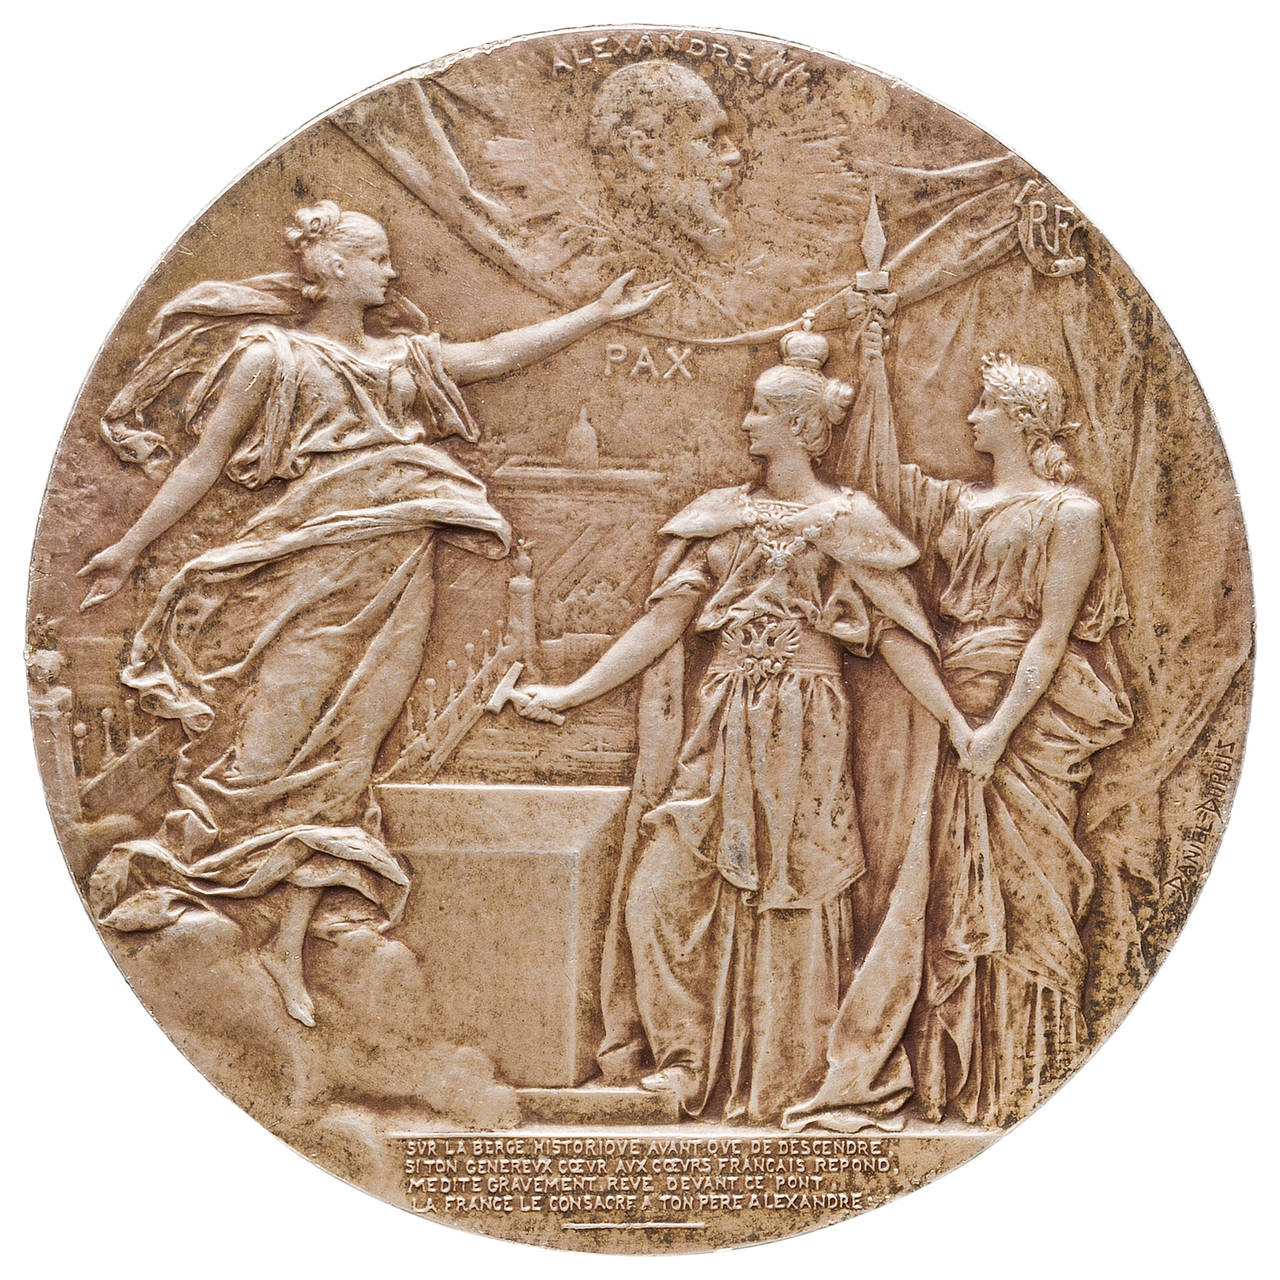 Franco-Russian Alexander III Commemorative Medal 1